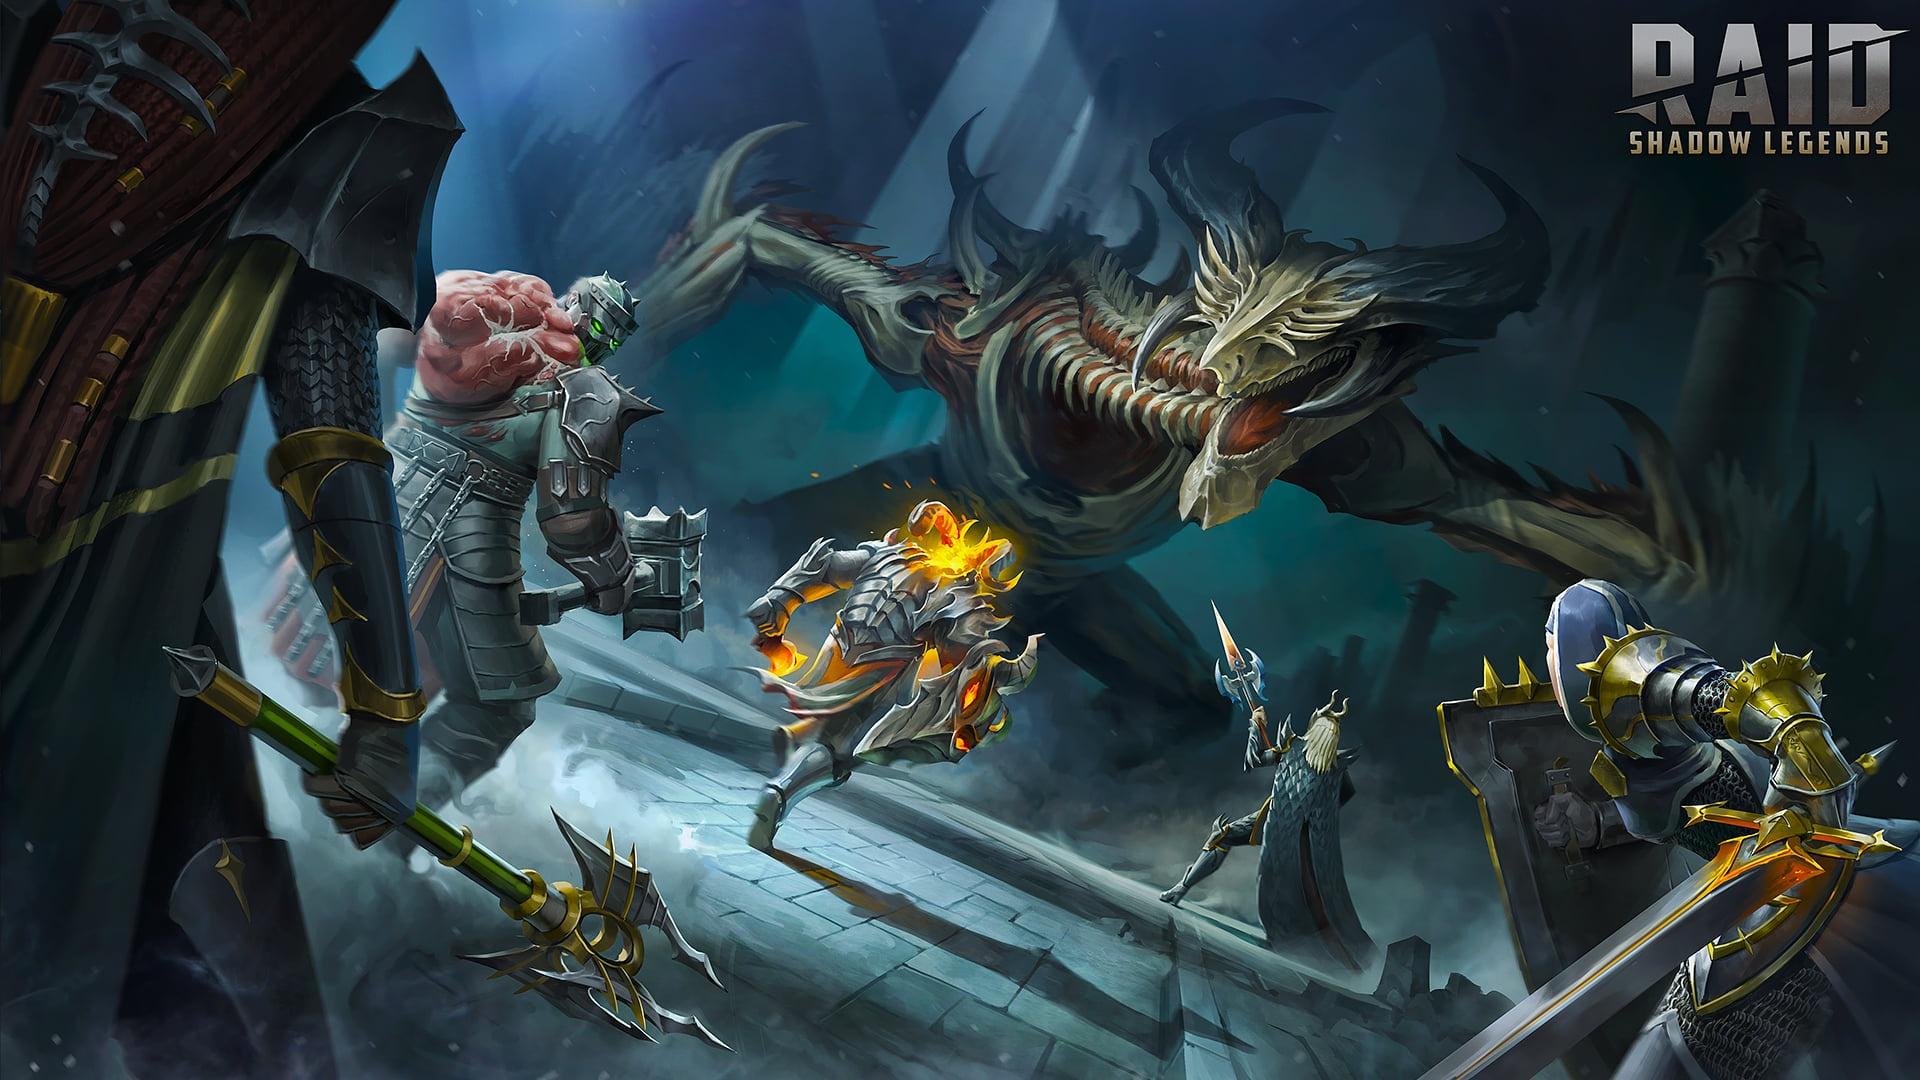 Raid Shadow Legends laptop wallpaper